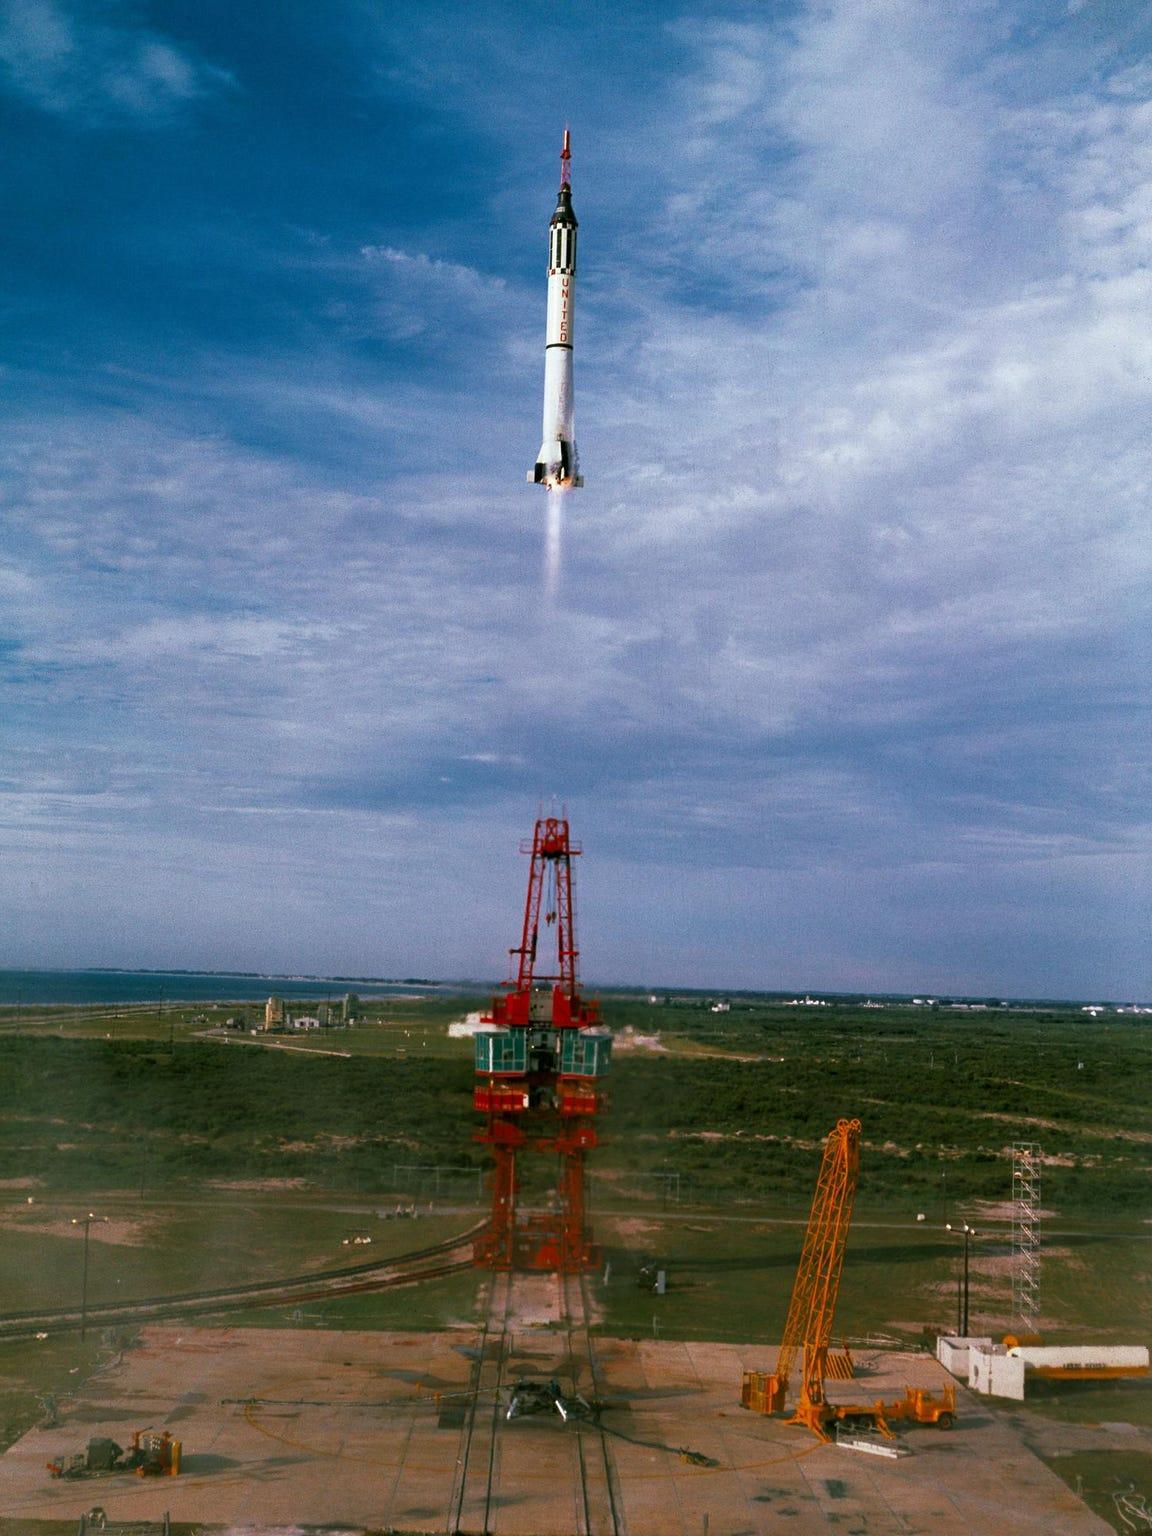 (21 July 1961) --- Mercury-Redstone 4 (MR-4) launch